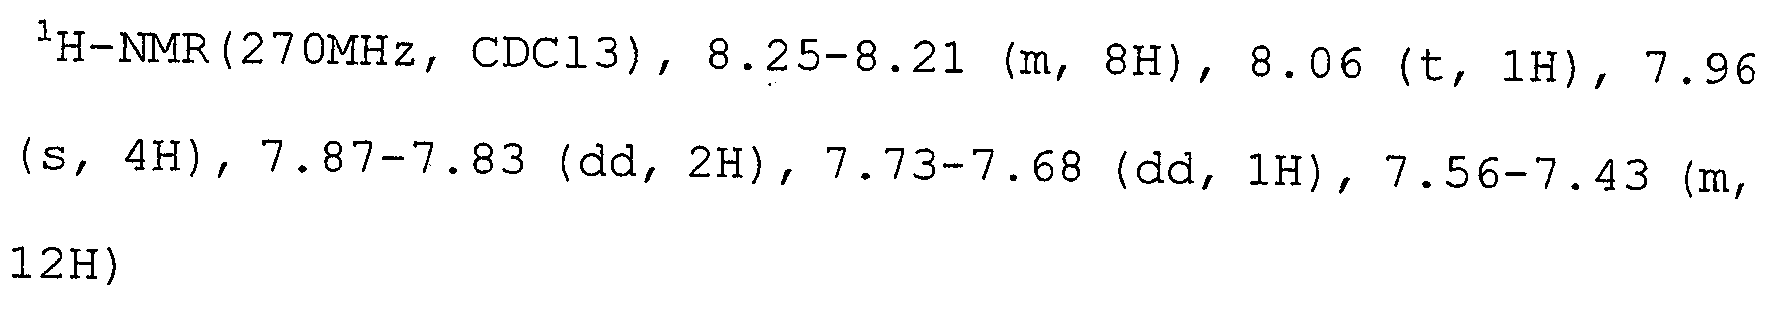 Figure 112010002231902-pat00095